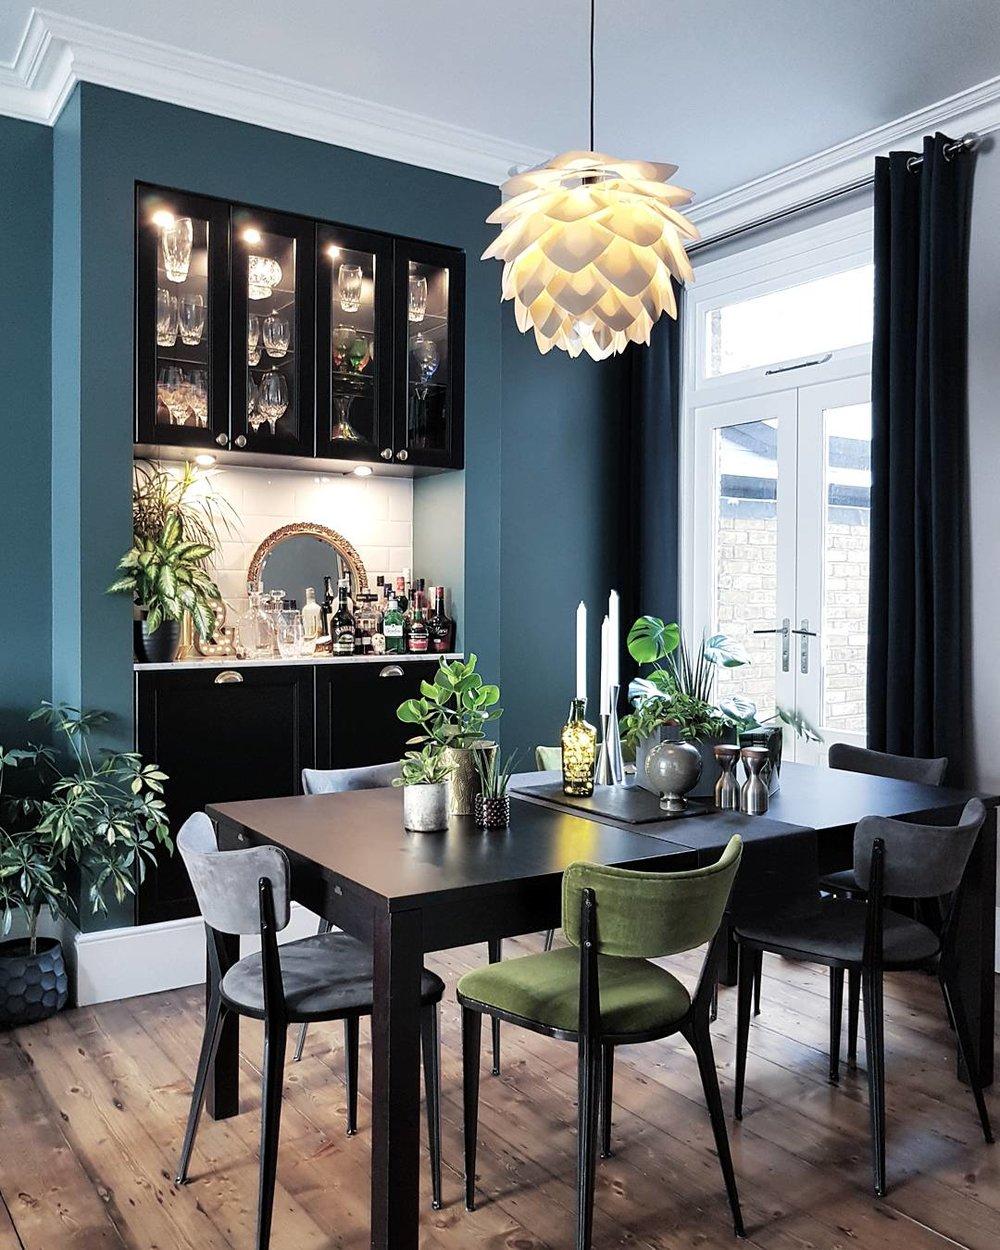 Table - Ikea ..... Pendant shade - royaldesign.co.uk